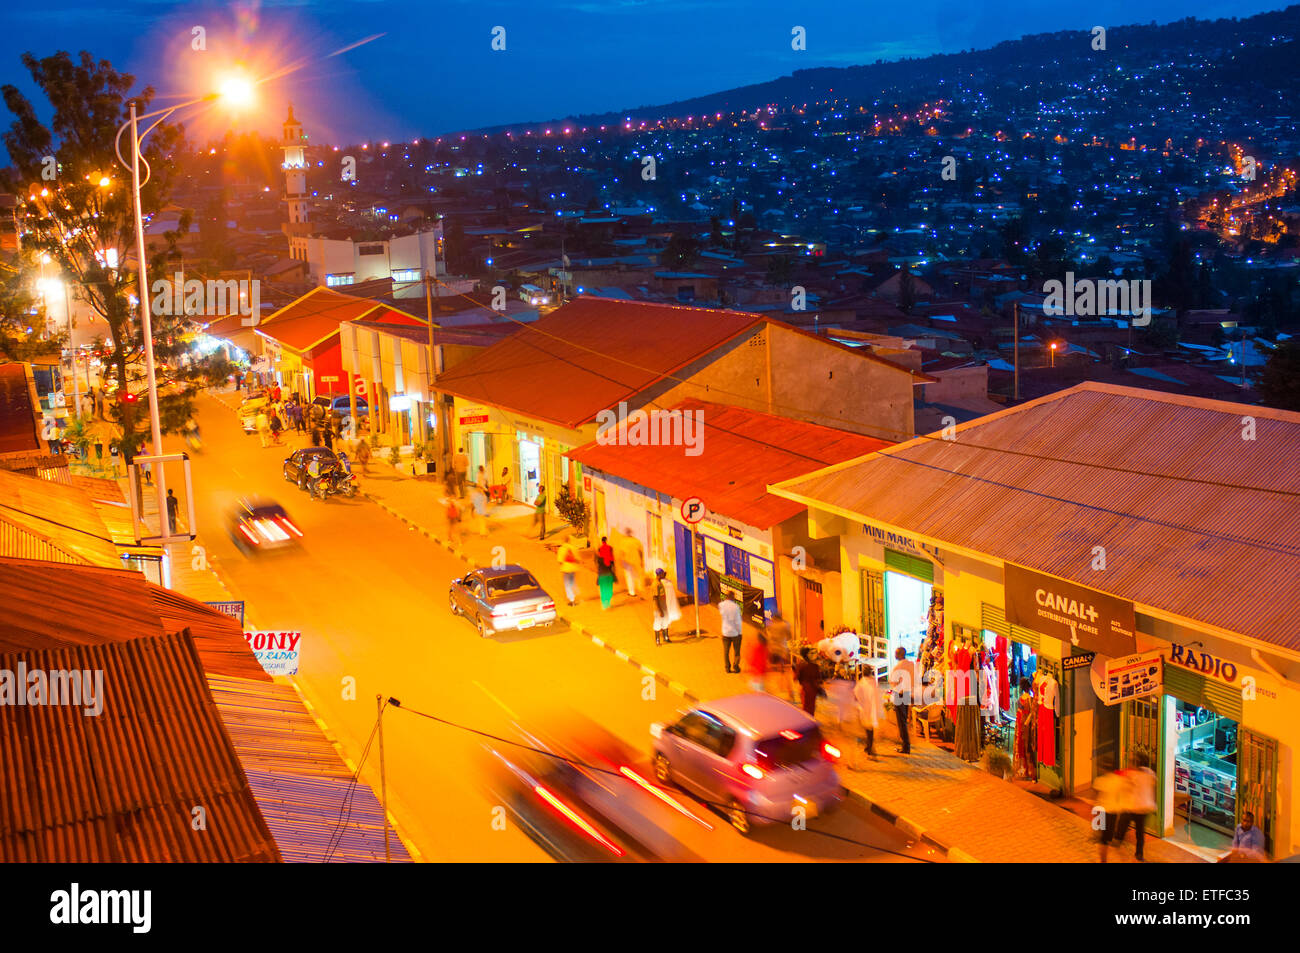 Aerial view of main street - KN 2 Avenue - at dusk, with hillside suburbs beyond, Nyamirambo, Kigali, Rwanda - Stock Image